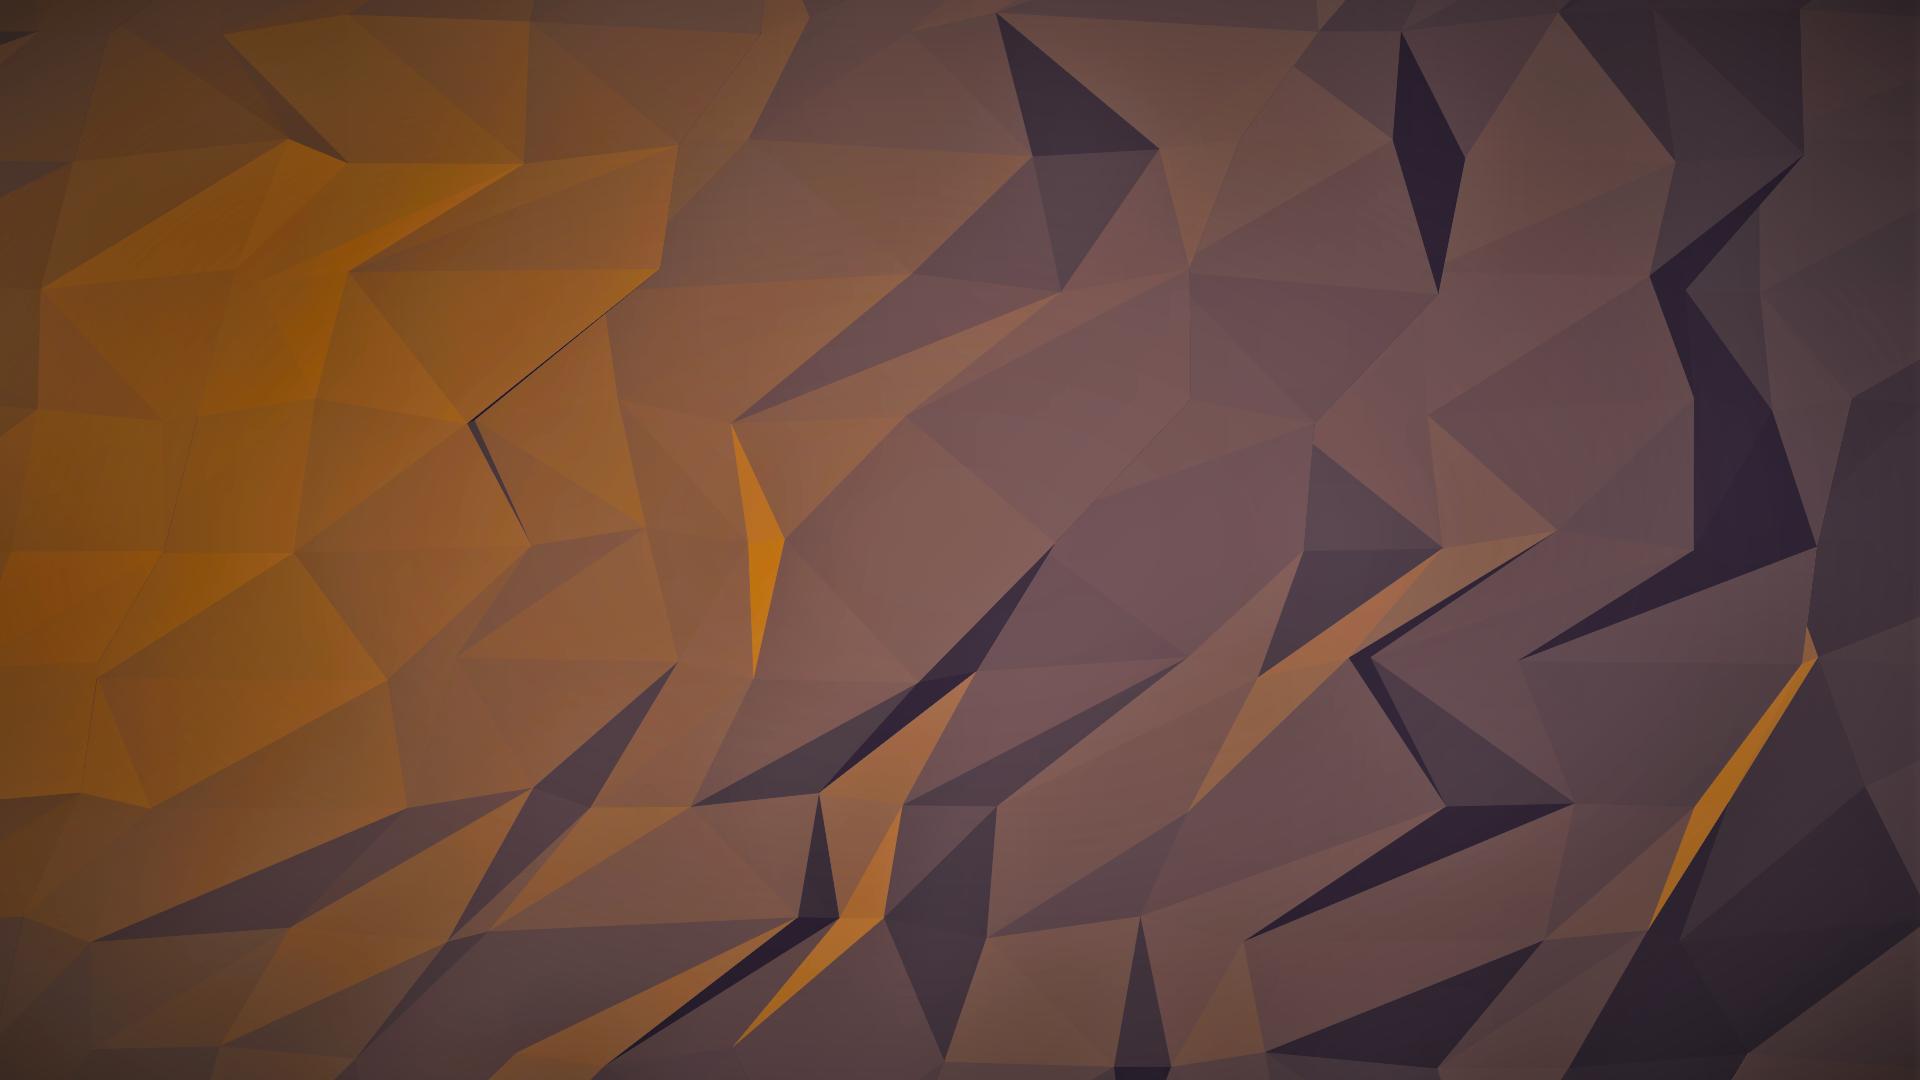 Sunlight Illustration Dark Abstract 3D Reflection Wall Symmetry Yellow Brown Triangle Pattern Orange Texture Circle ART